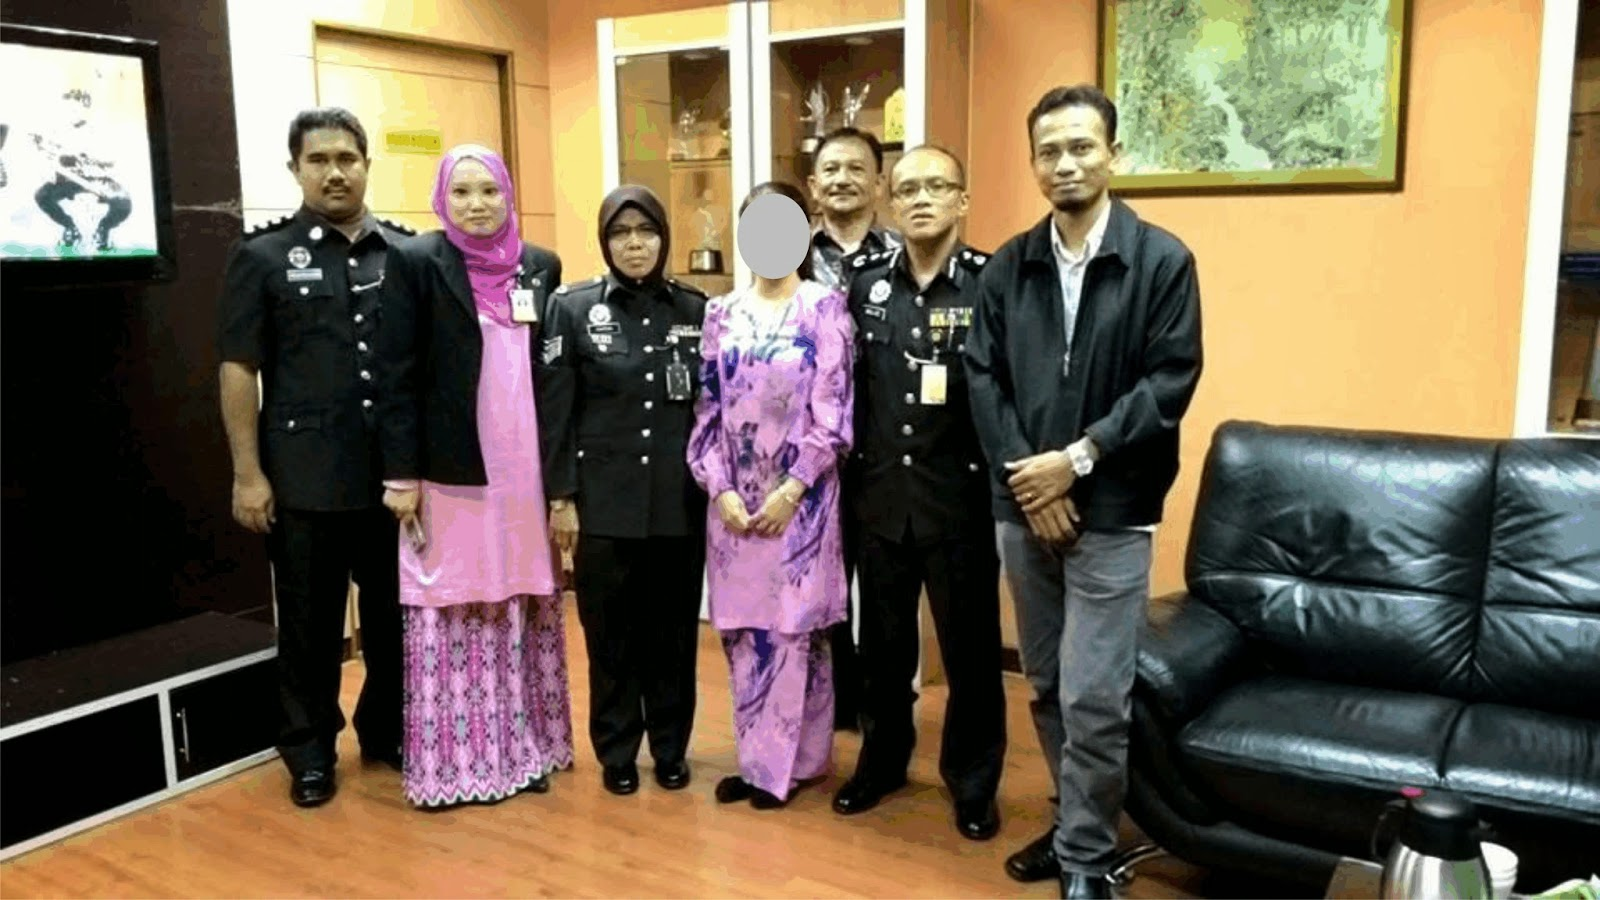 Wanita Hari Ini (WHI-TV3), TKPj Abdul Aziz Mohamad, KIP Kasim Sharif, Khir Khalid